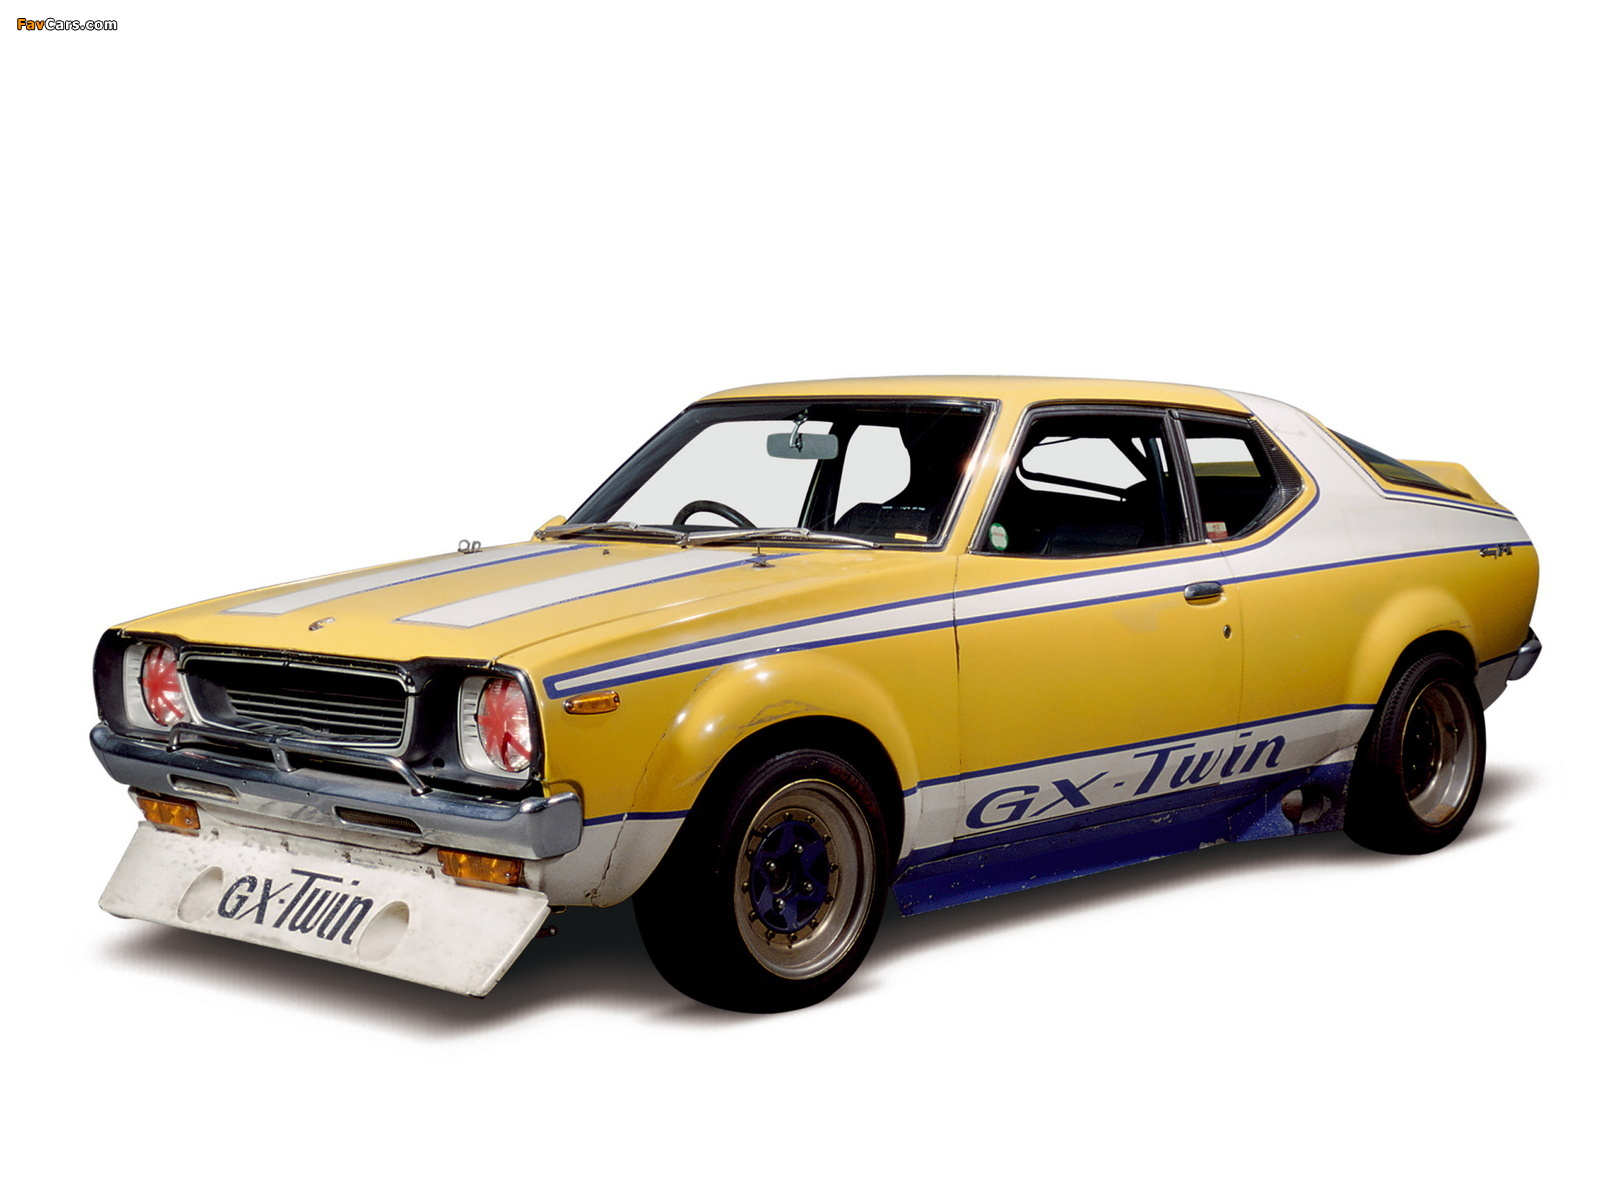 Photos of Nissan Cherry GX-Twin (F10) 1976 (1600 x 1200)